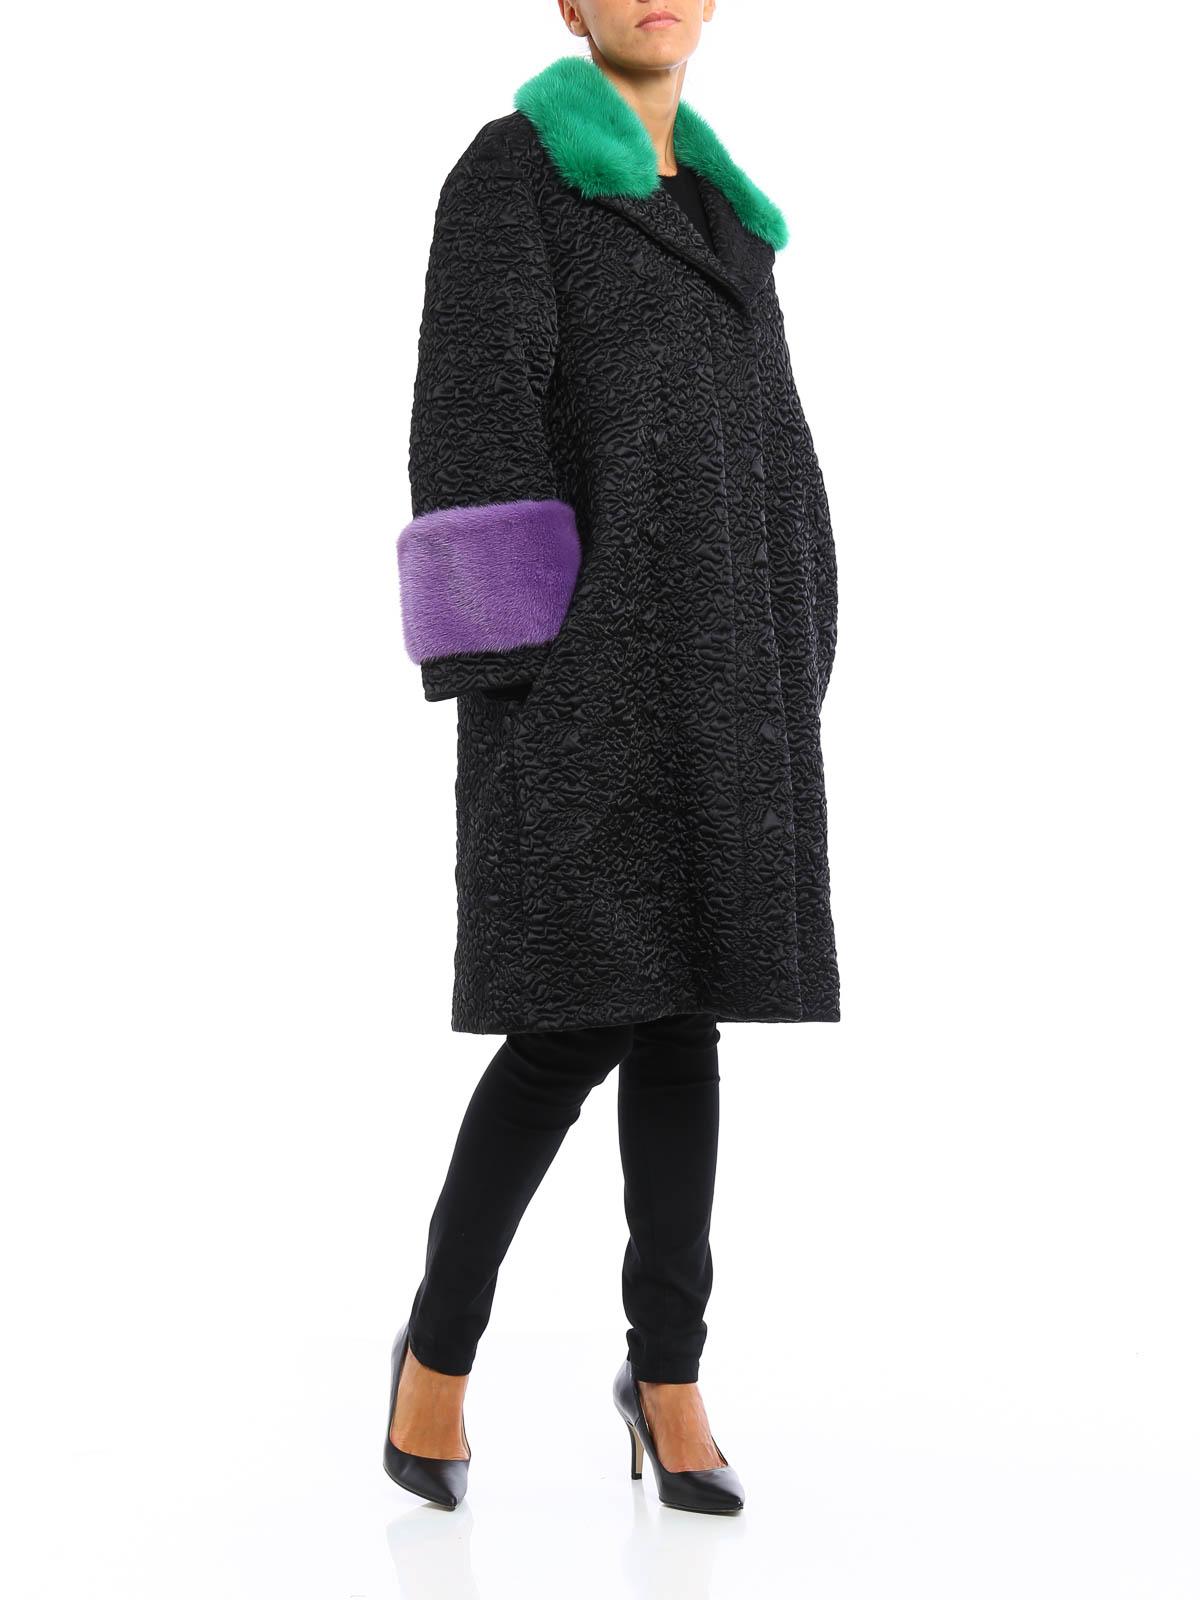 39182b316 Gucci - Mink fur detailed nylon coat - Fur & Shearling Coats ...